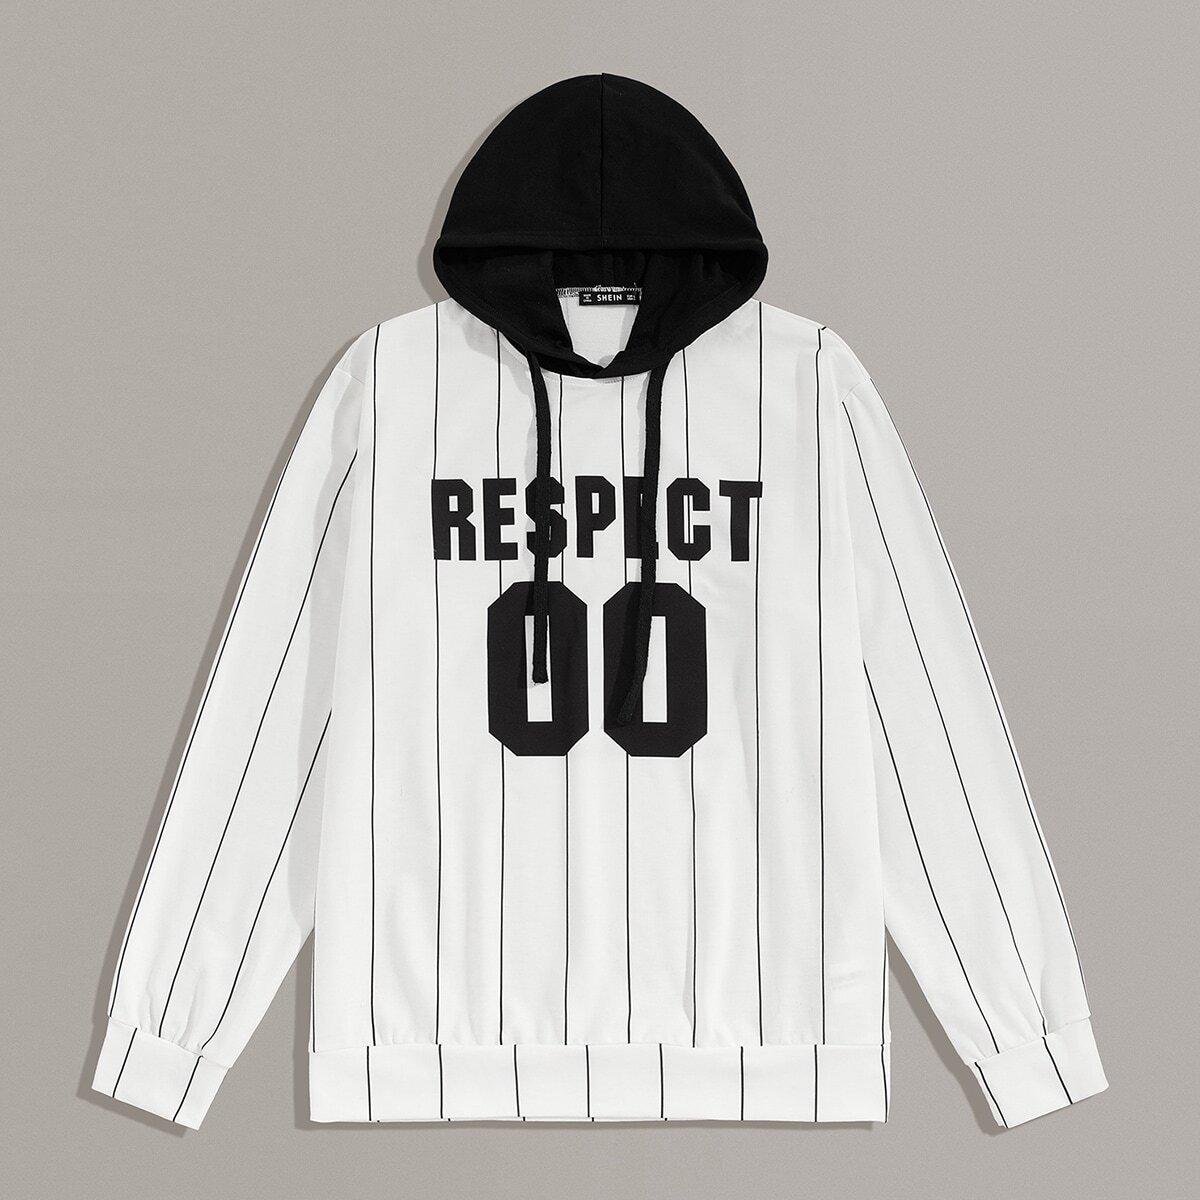 Tweekleurige hoodie met gemengde print voor heren